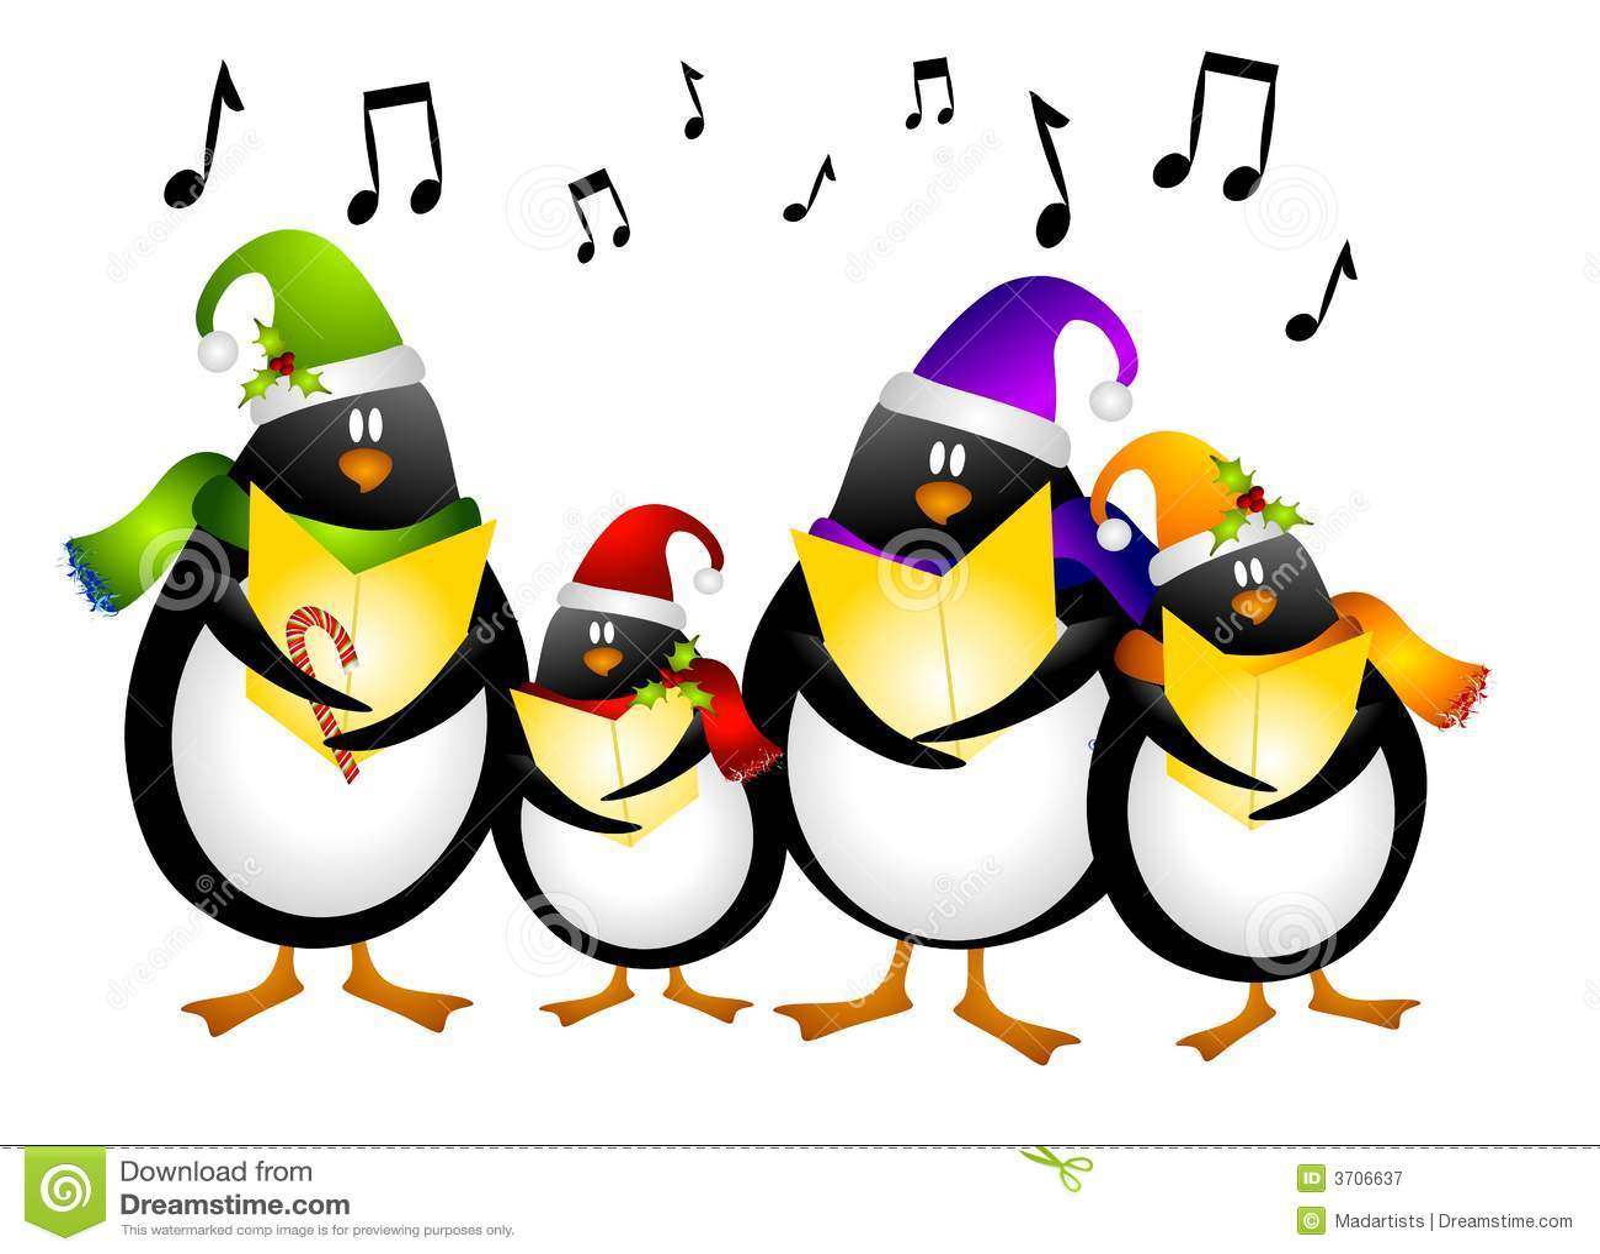 Singing Penguin Christmas Carolers Stock Illustration ...